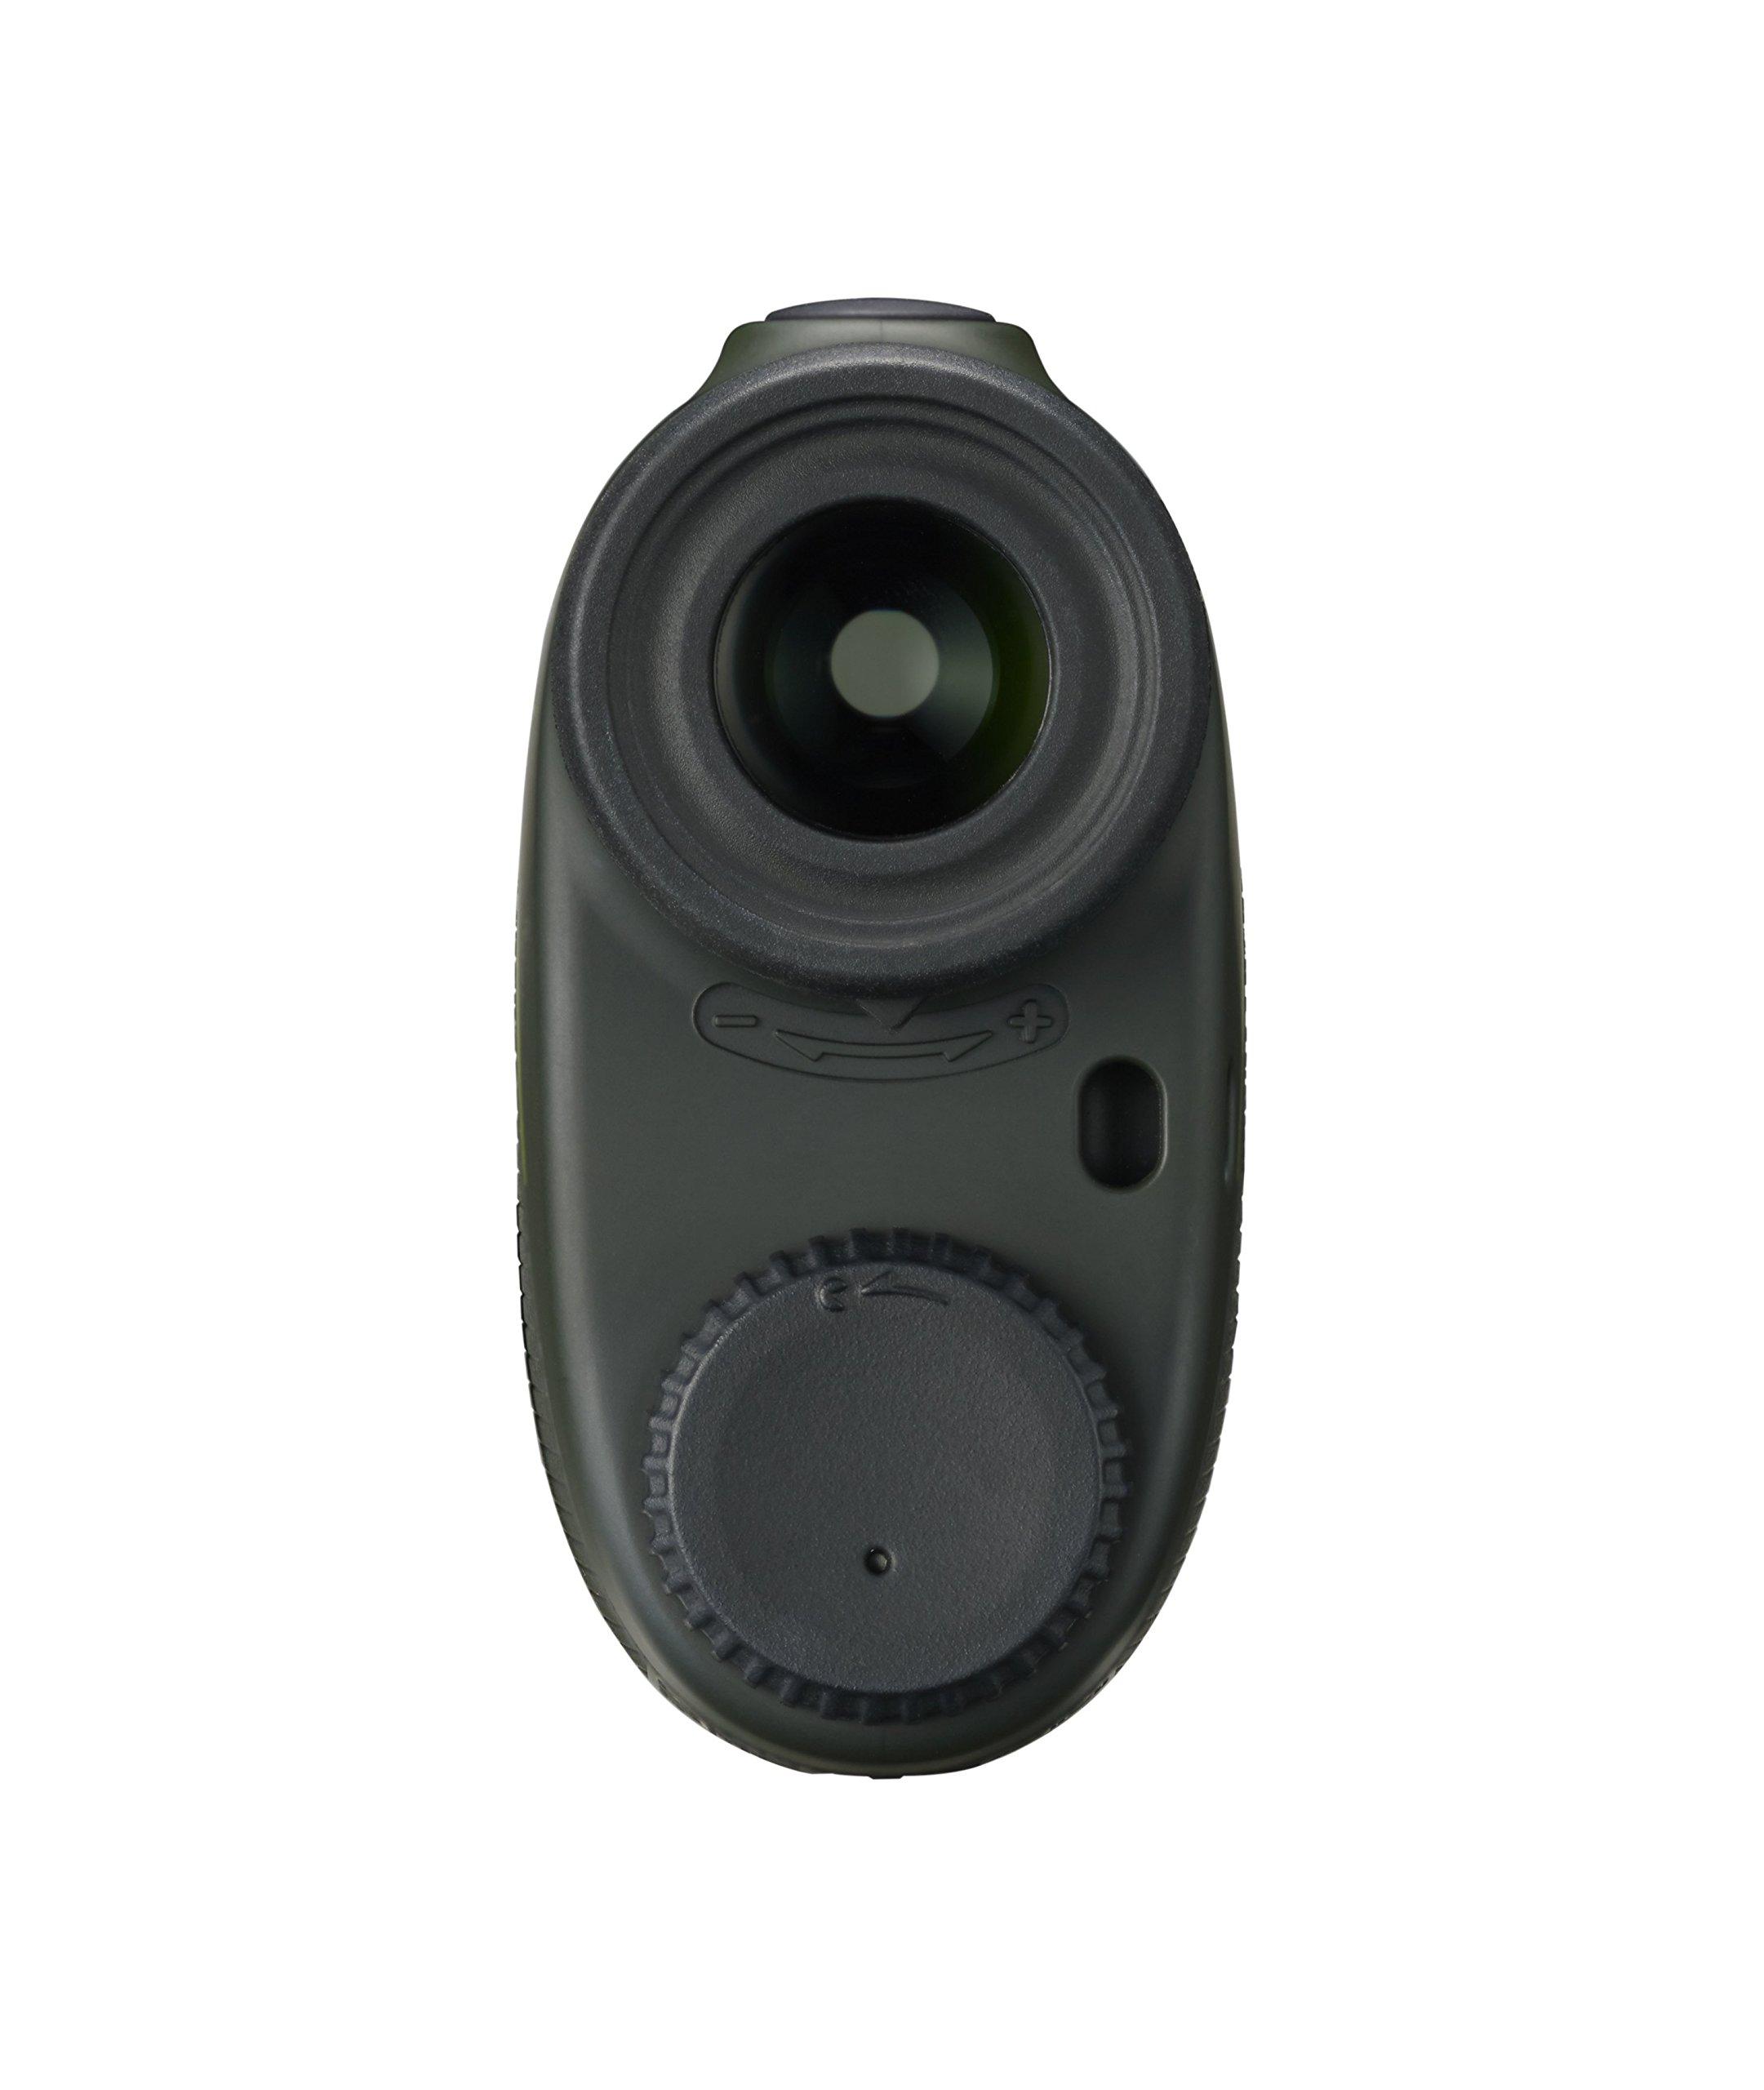 Nikon 16224 Arrow ID 3000 Bowhunting Laser Rangefinder by Nikon (Image #4)